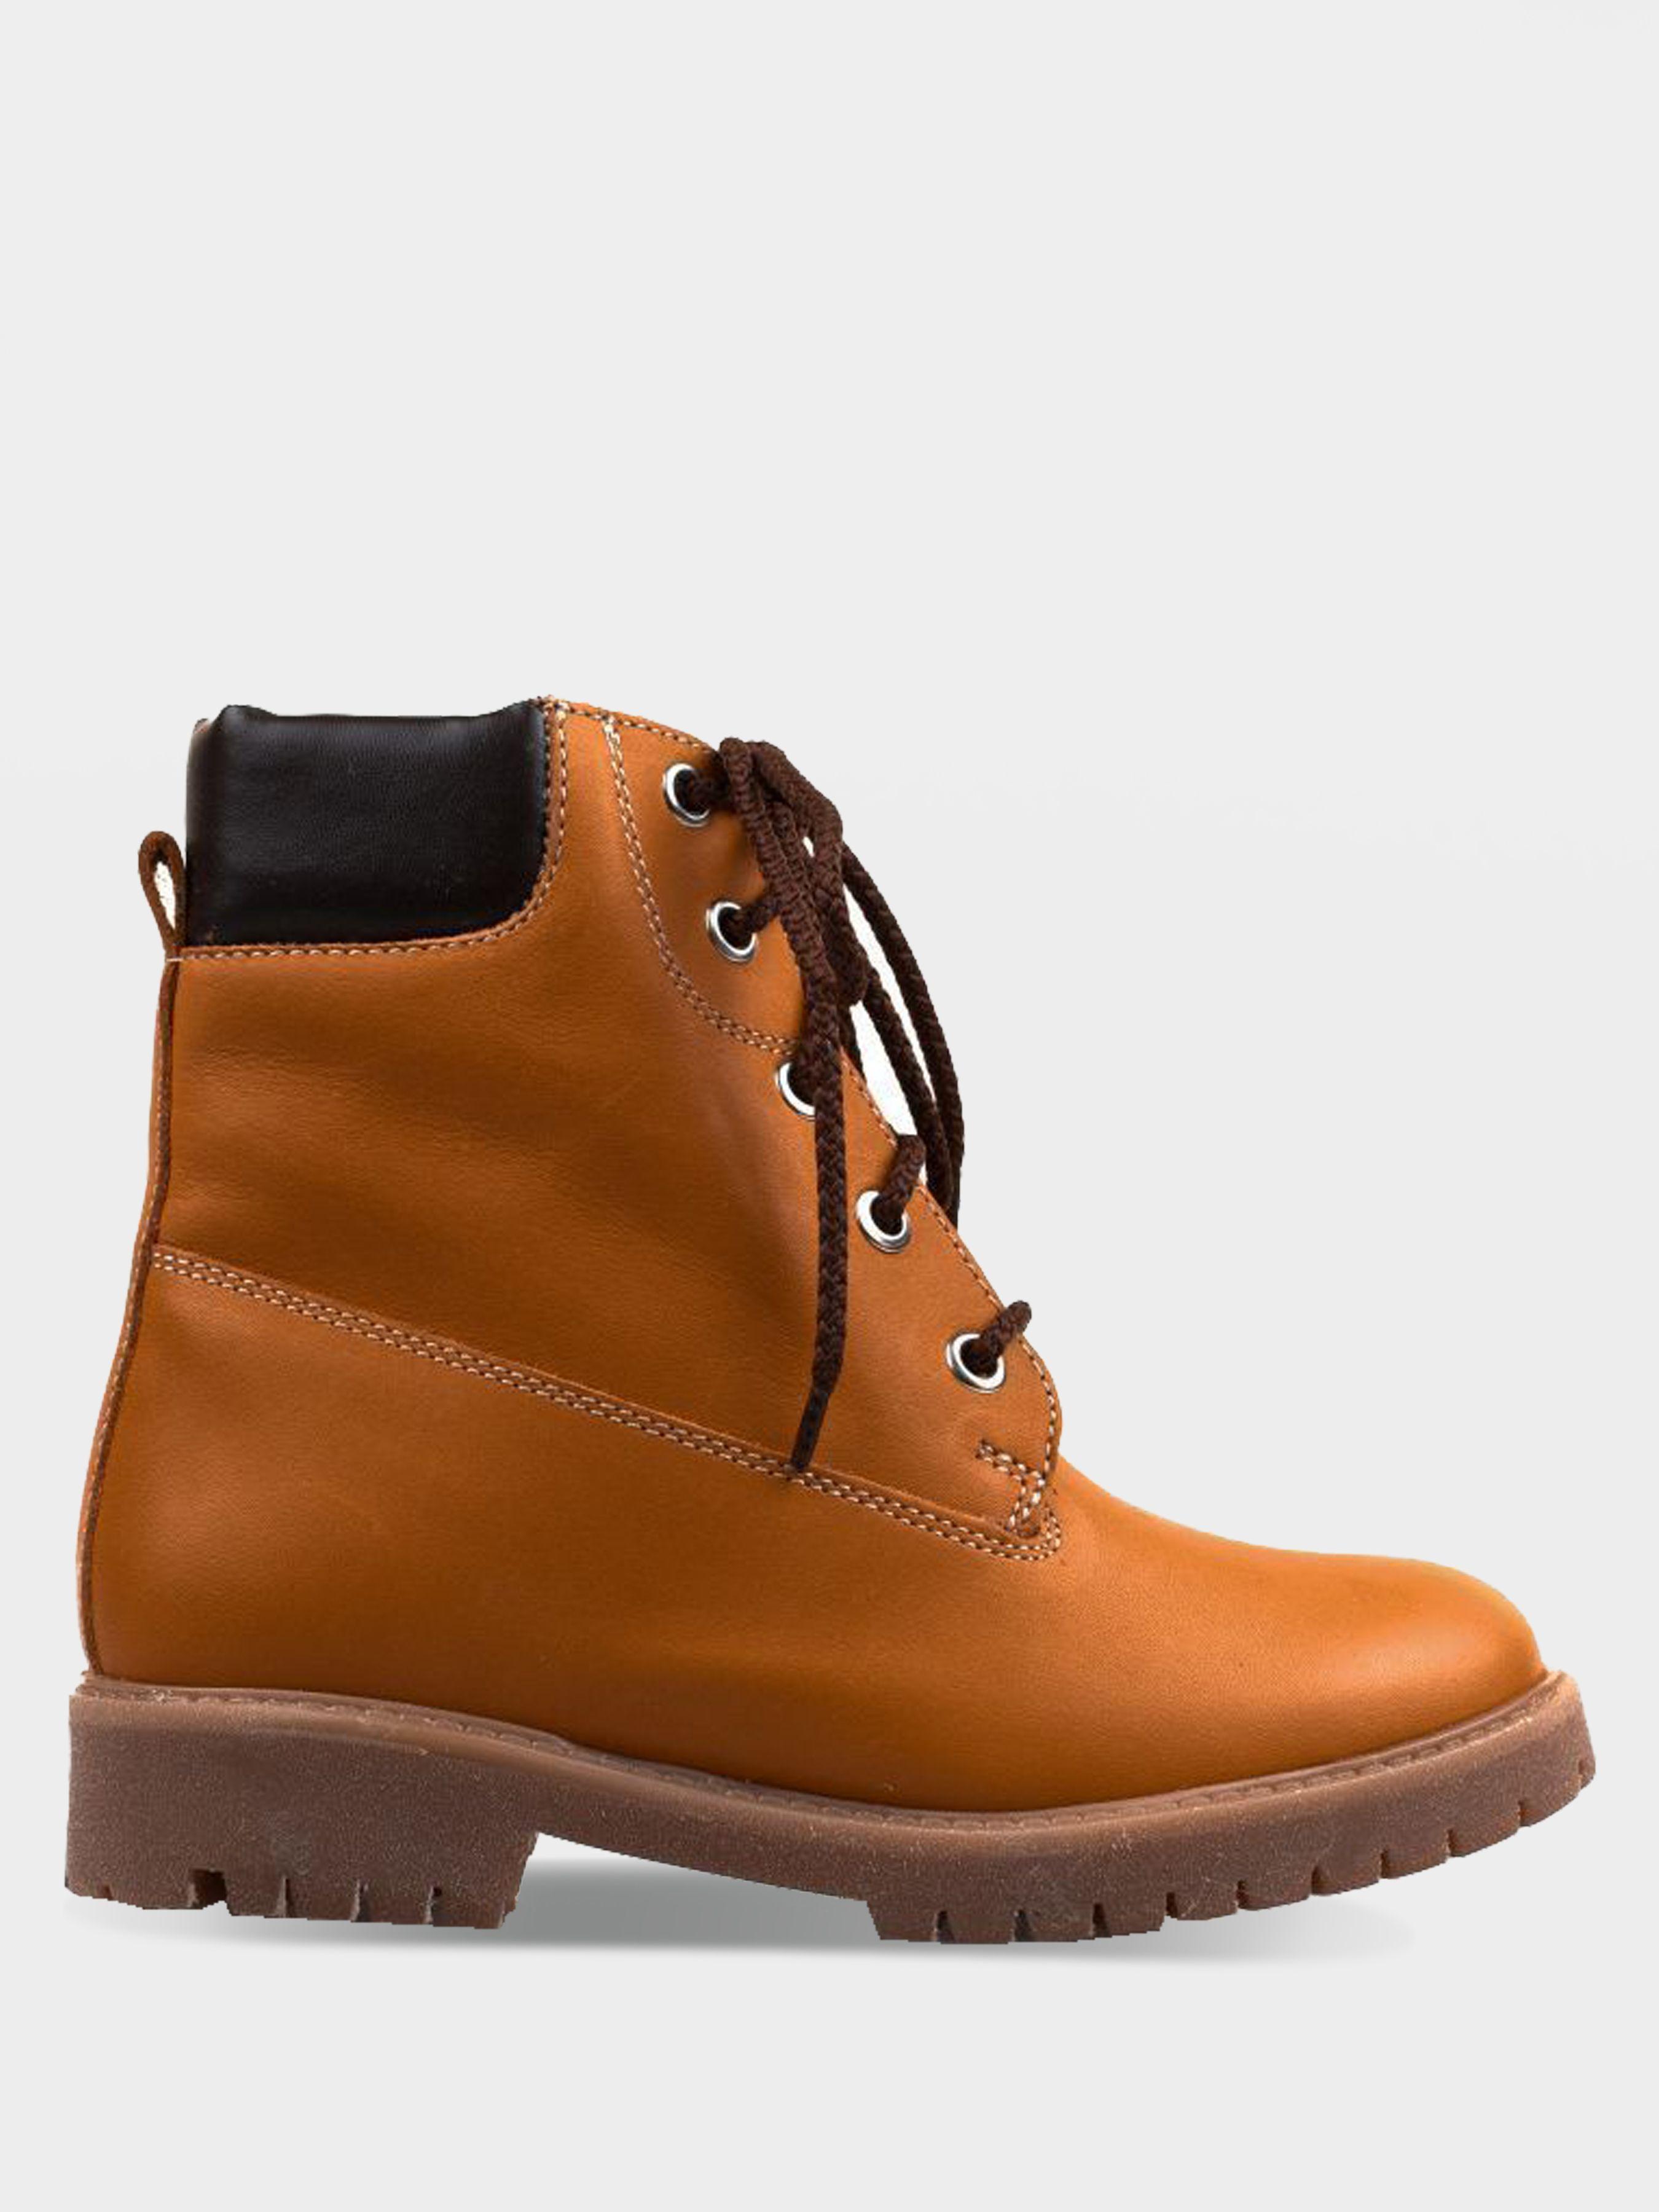 Купить Ботинки детские Braska Кайрос AE148, Желтый